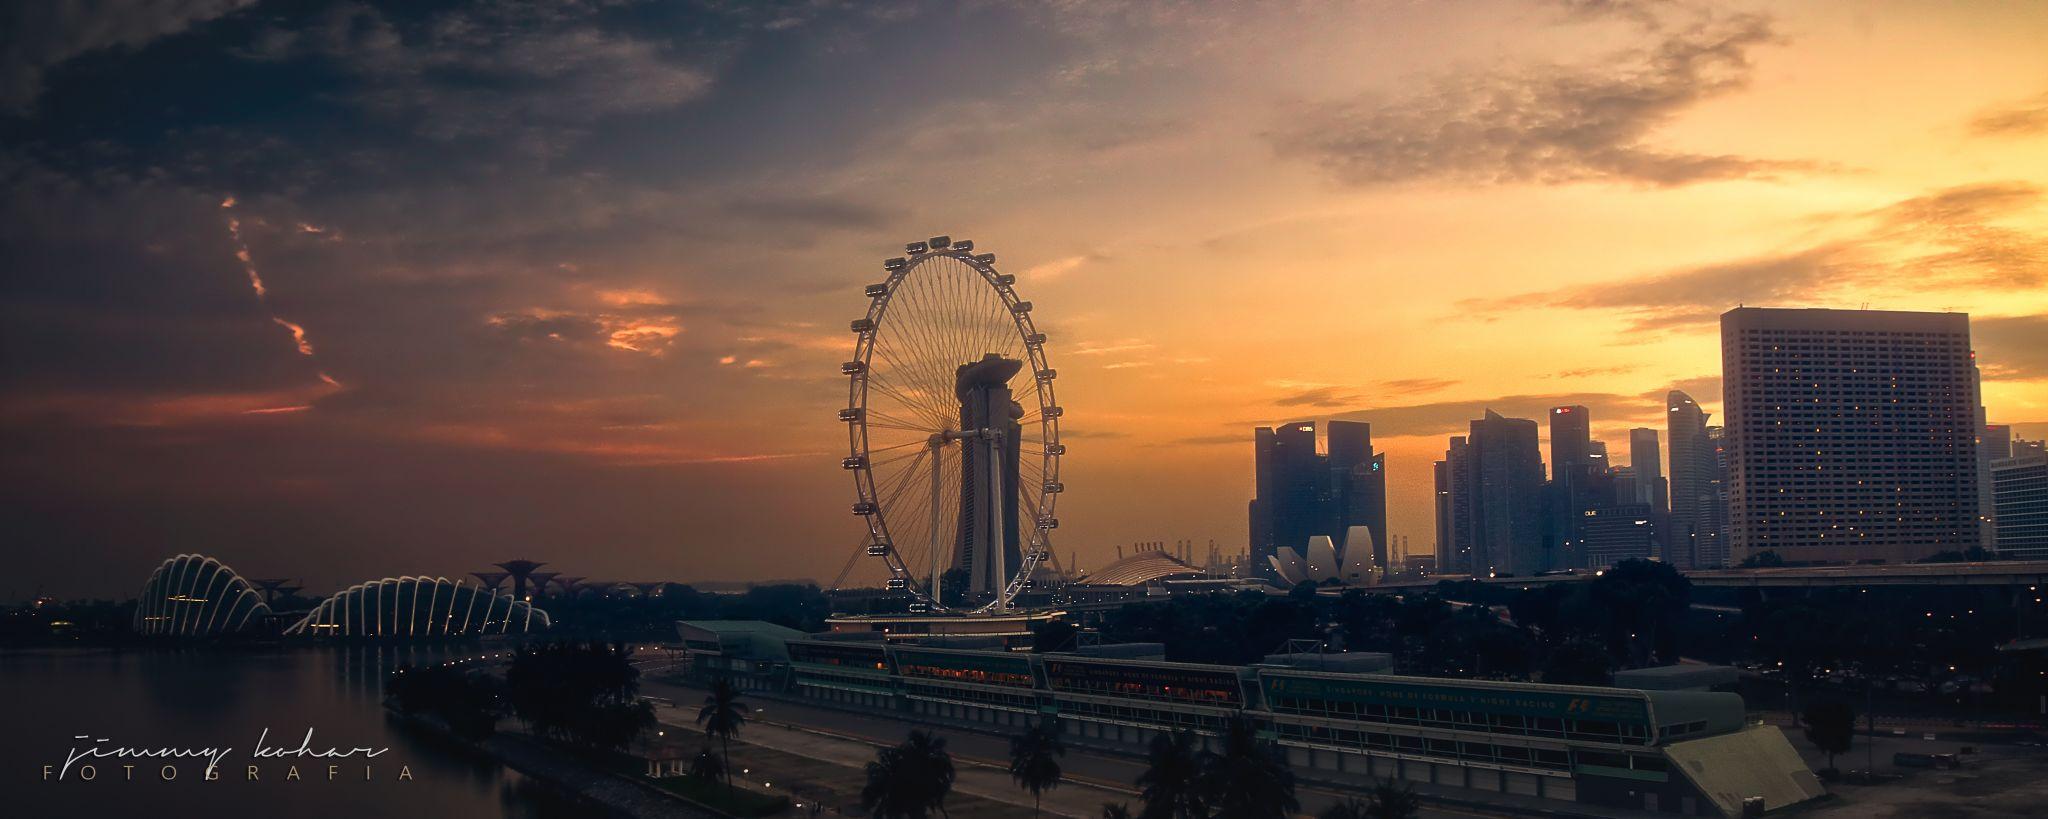 Skyline Sunset from the ECP Bridge, Marina Bay, Singapore